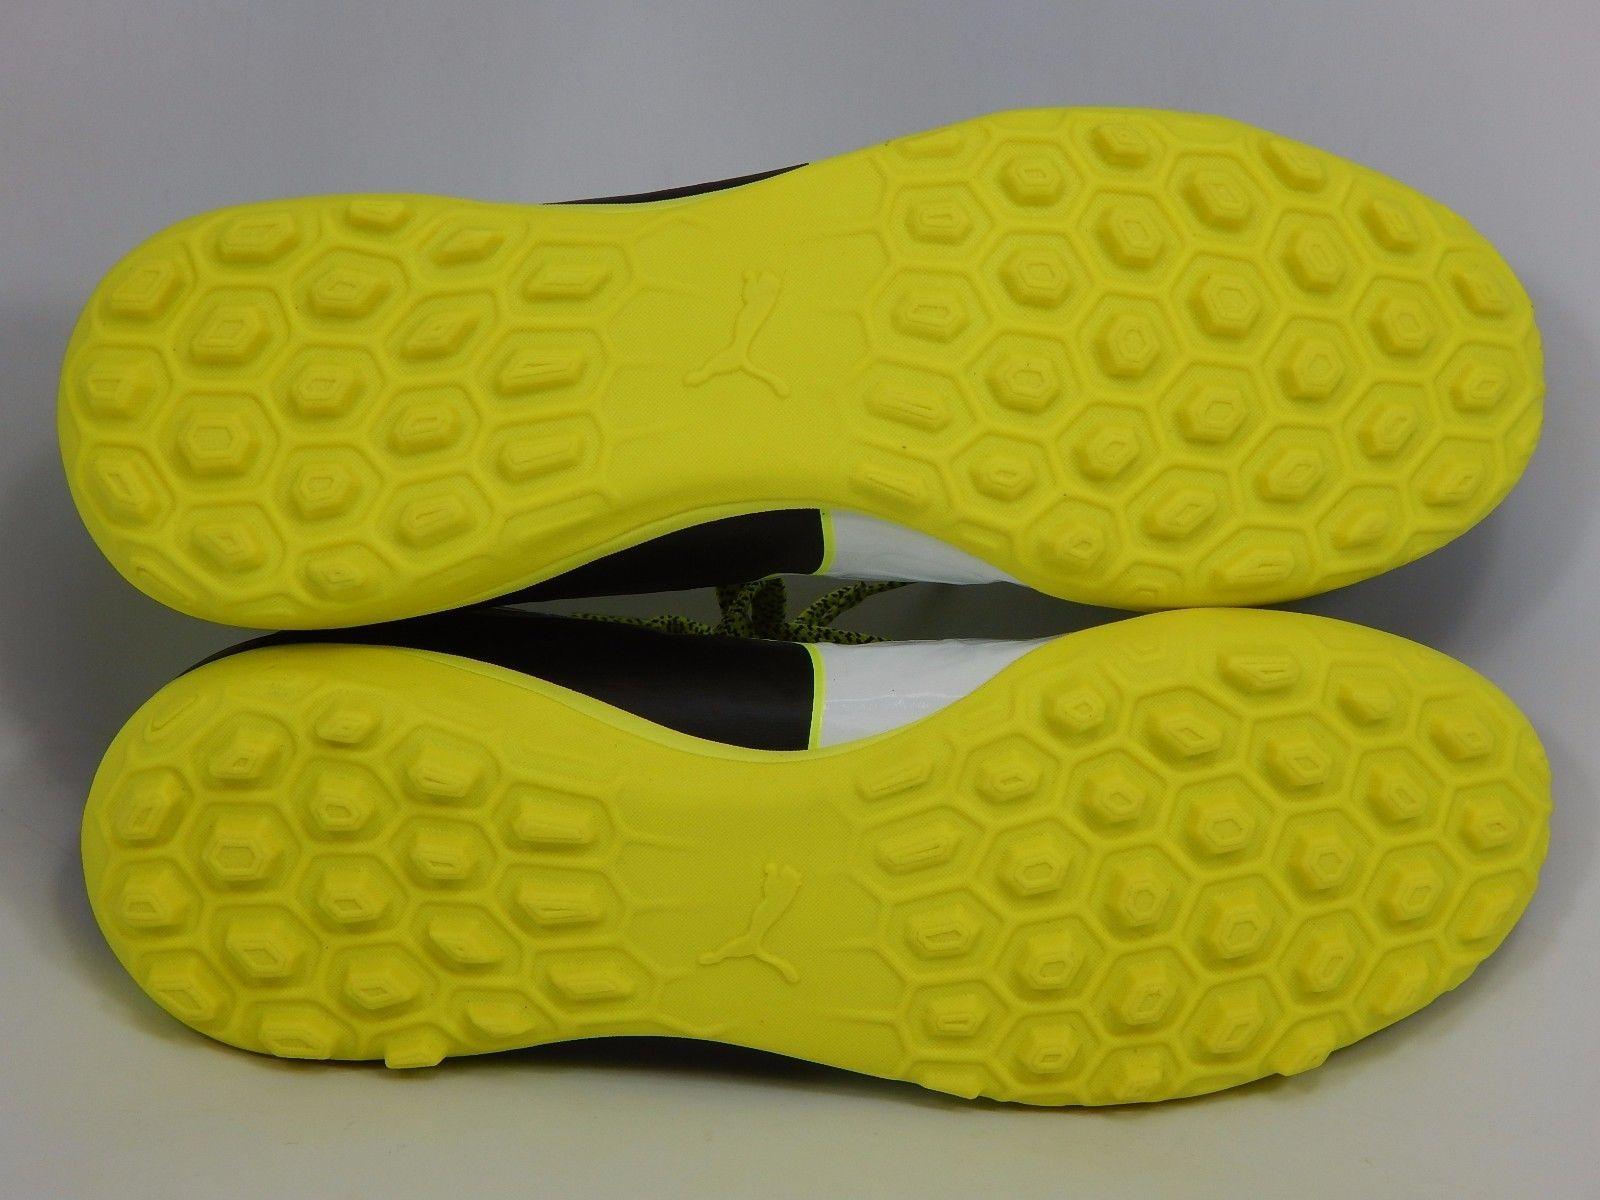 Puma evoTouch 3 TT Men's Soccer Cleats Size US 9 M (D) EU 42 Black Yellow